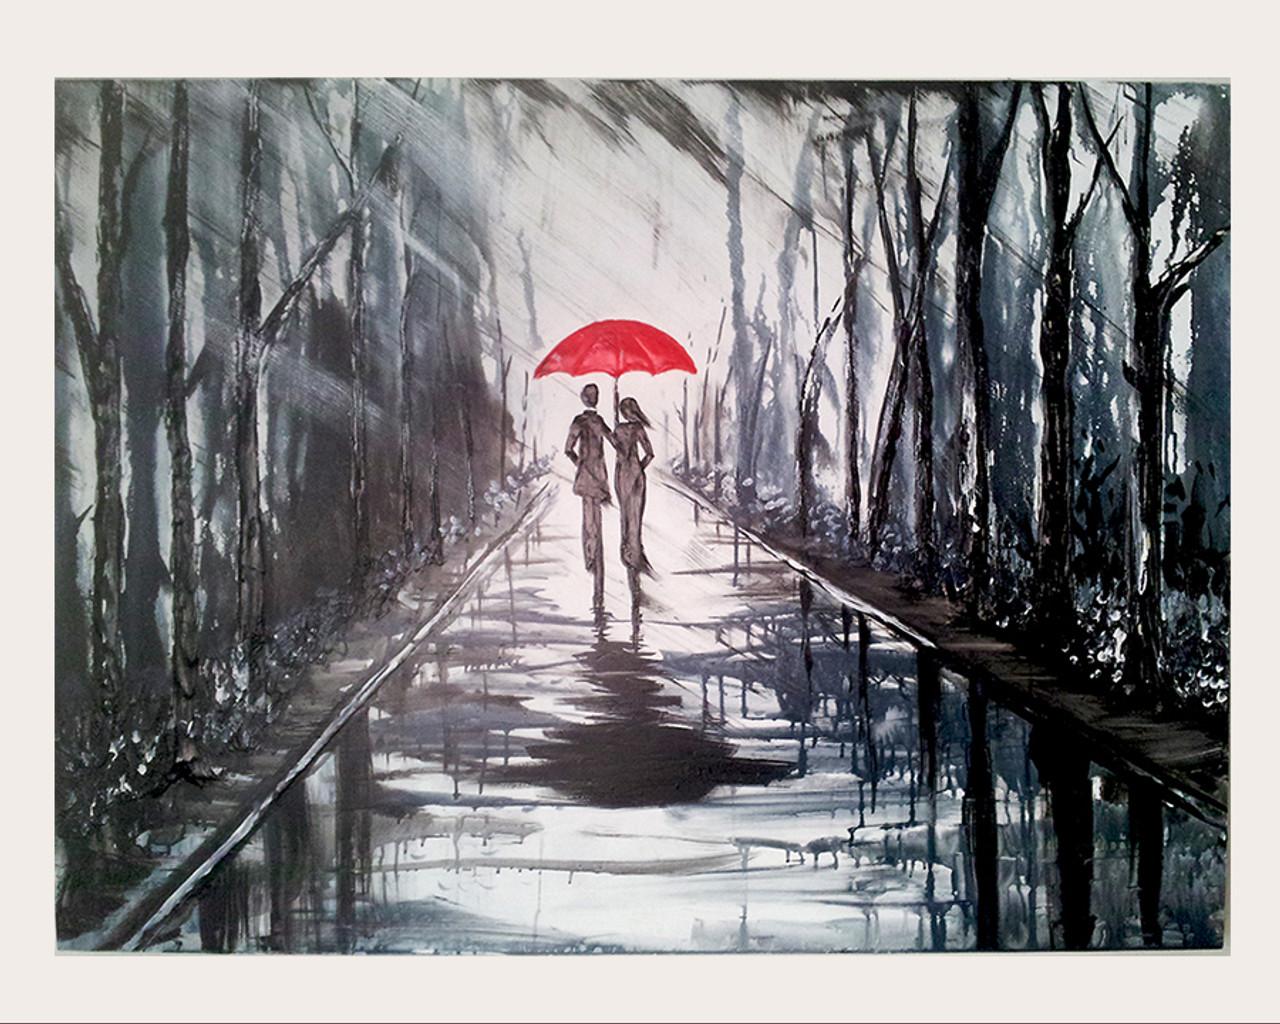 Buy LANDSCAPE PAINTING P-50 Handmade Painting by DARSHANA ...